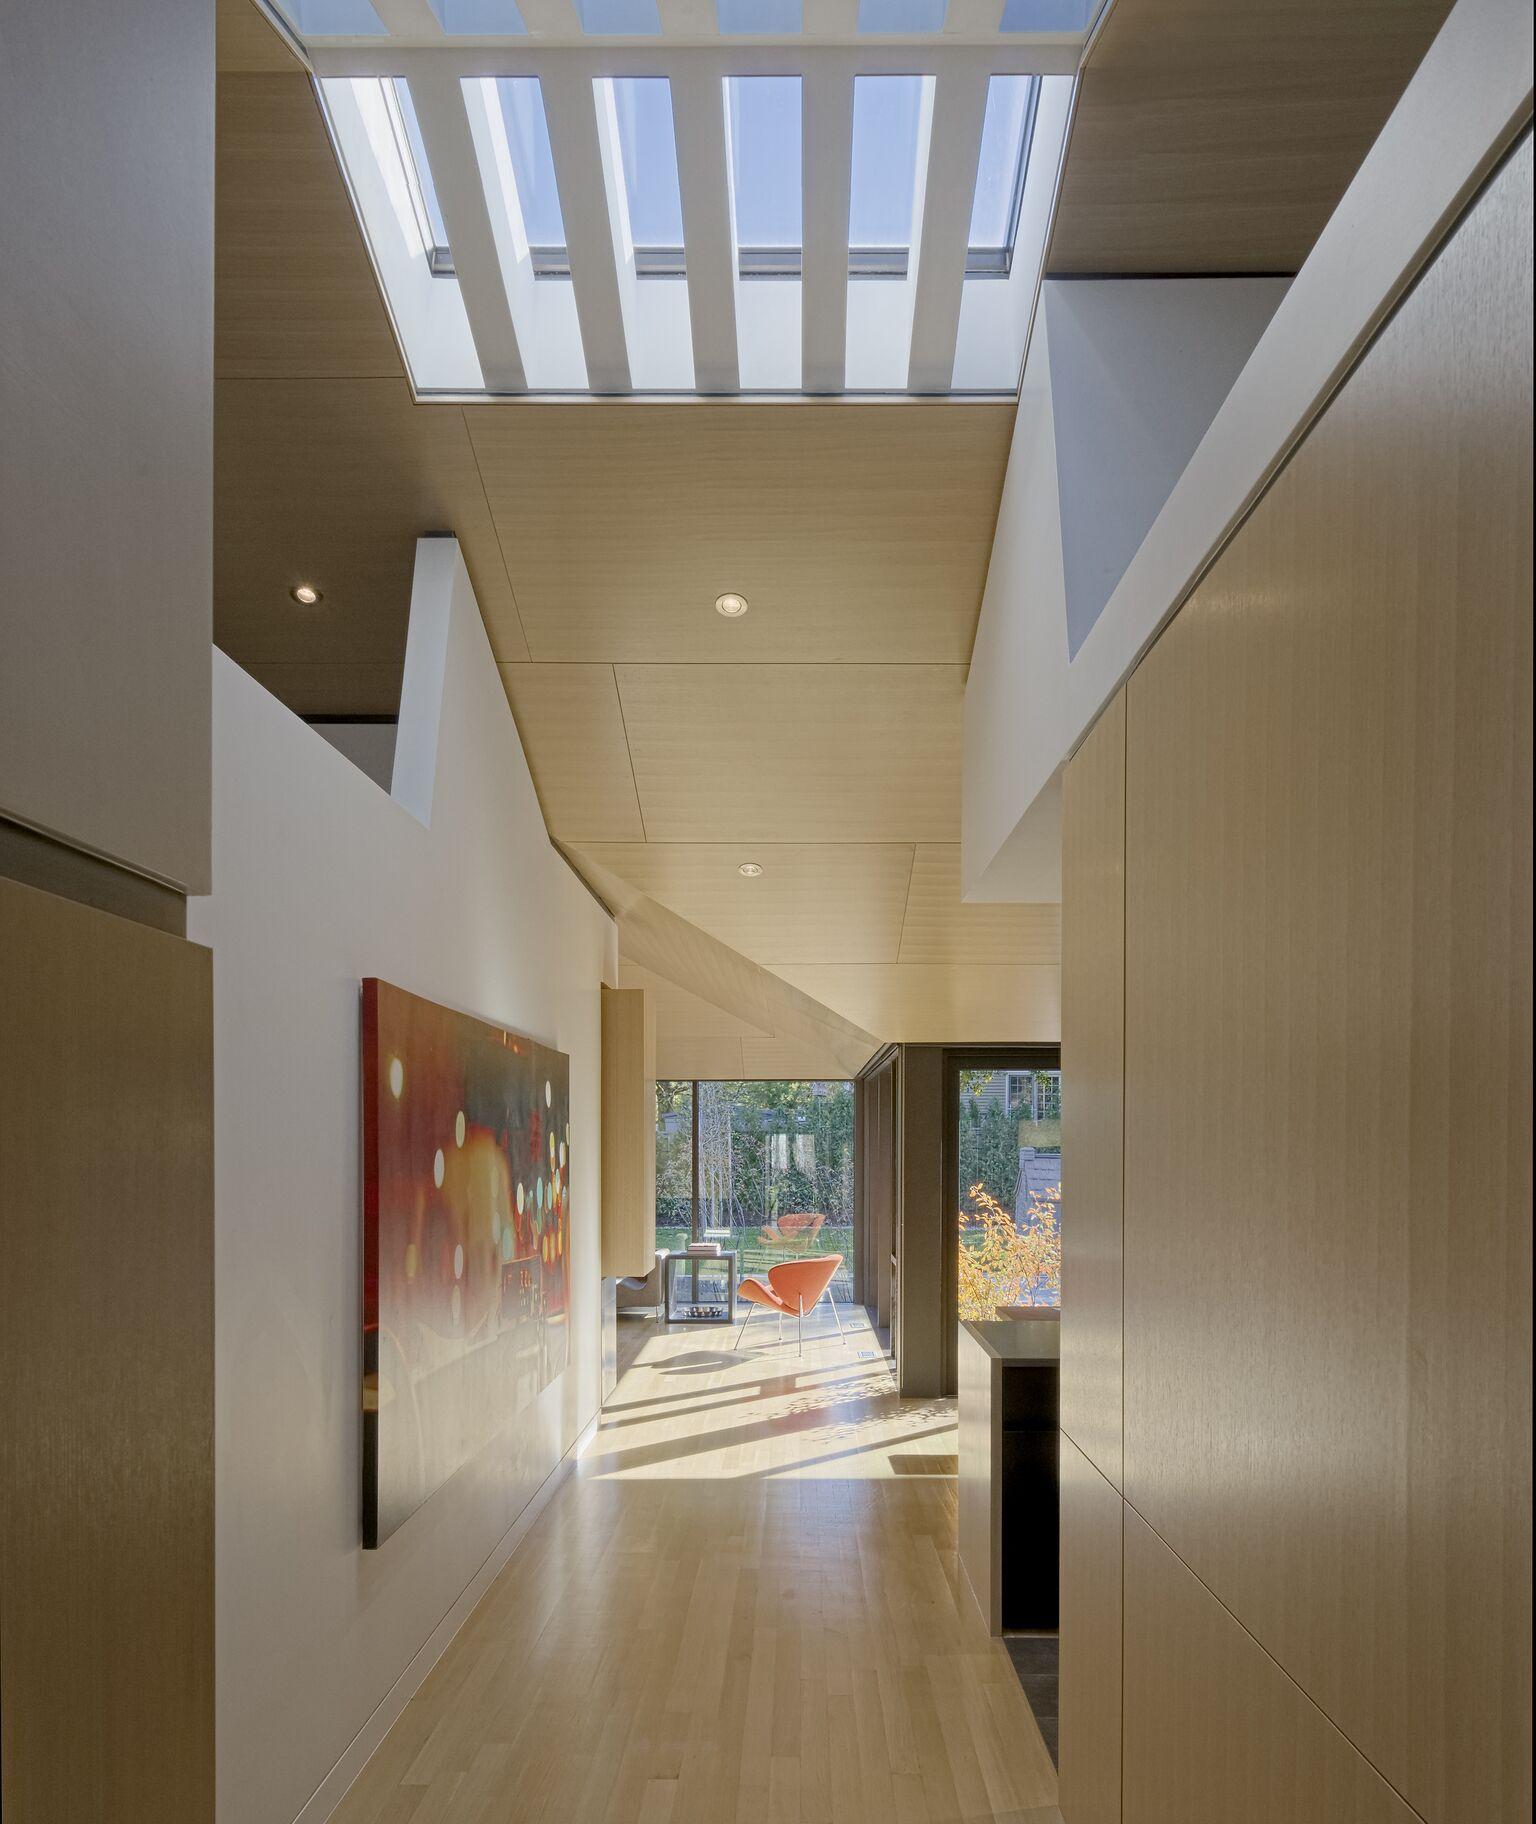 Abenbare House Interior Hallway